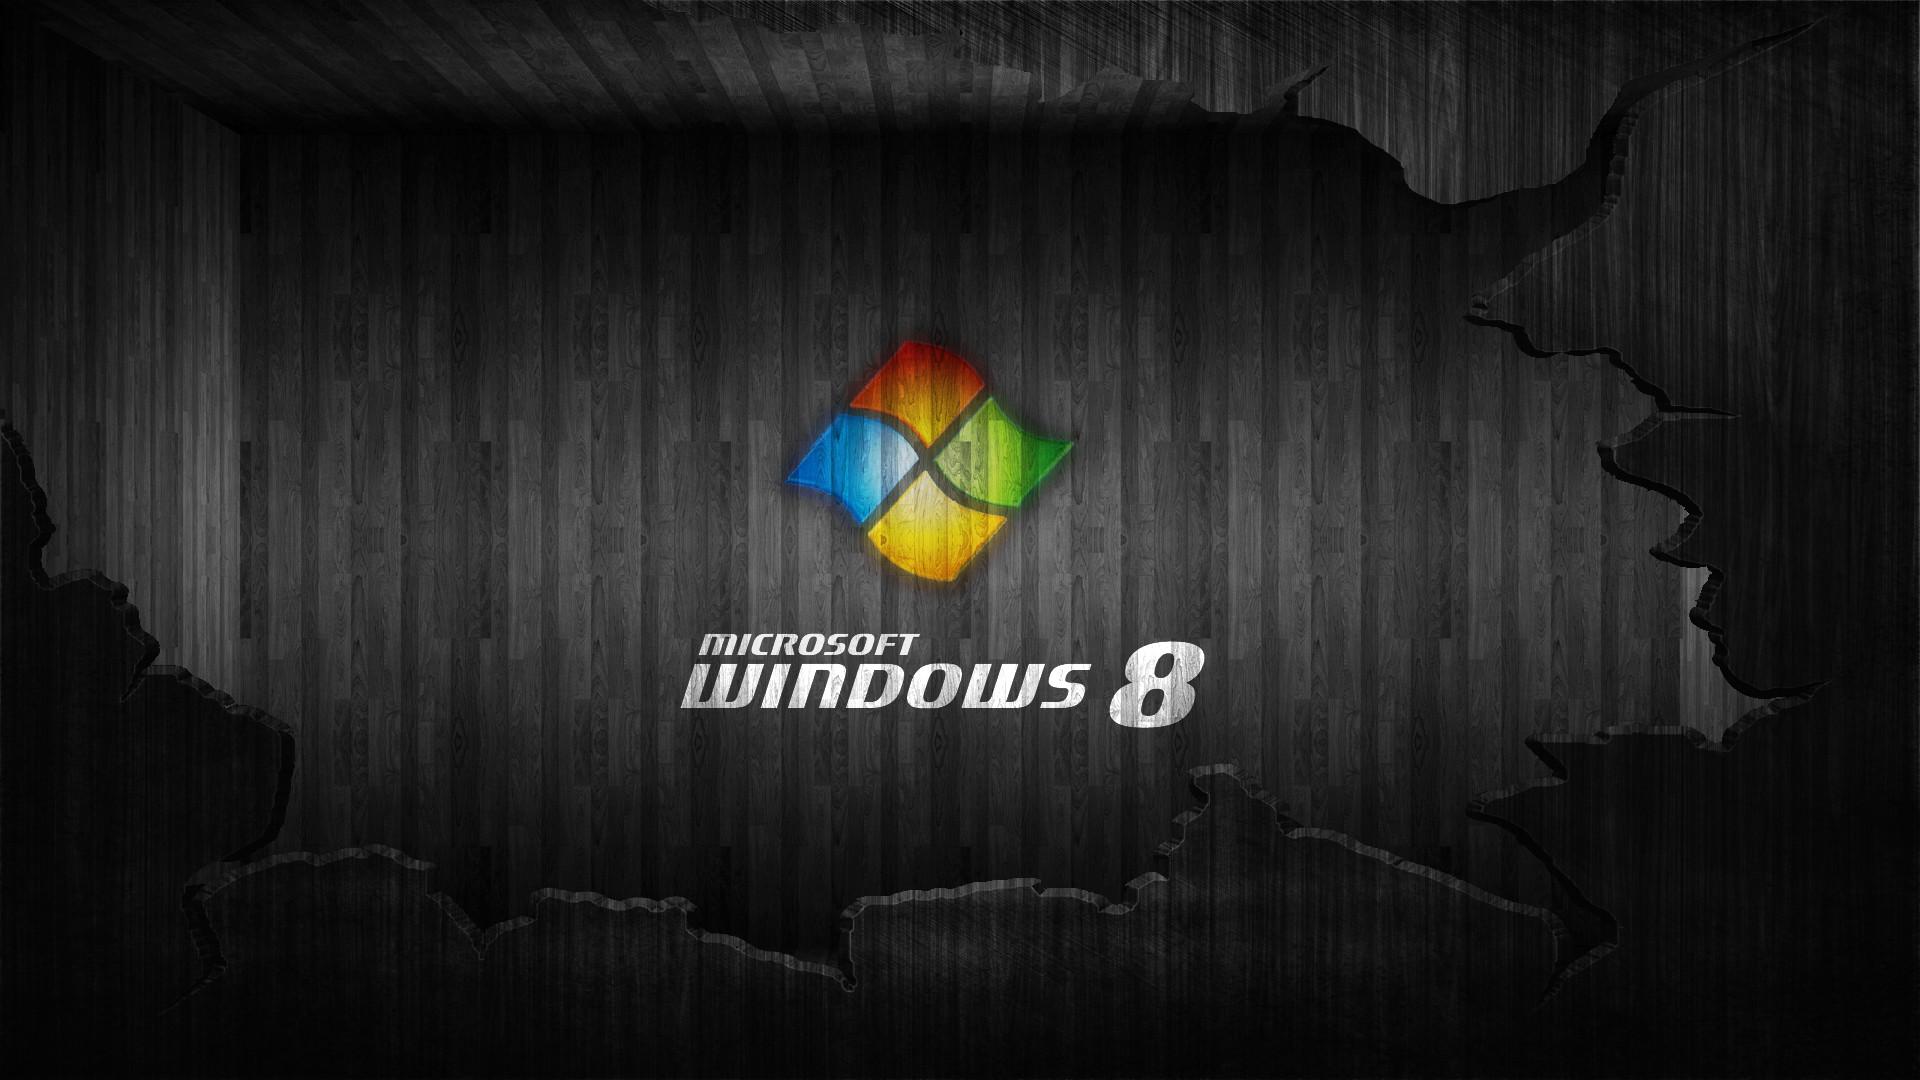 Windows 8 Wallpaper 1080p 1